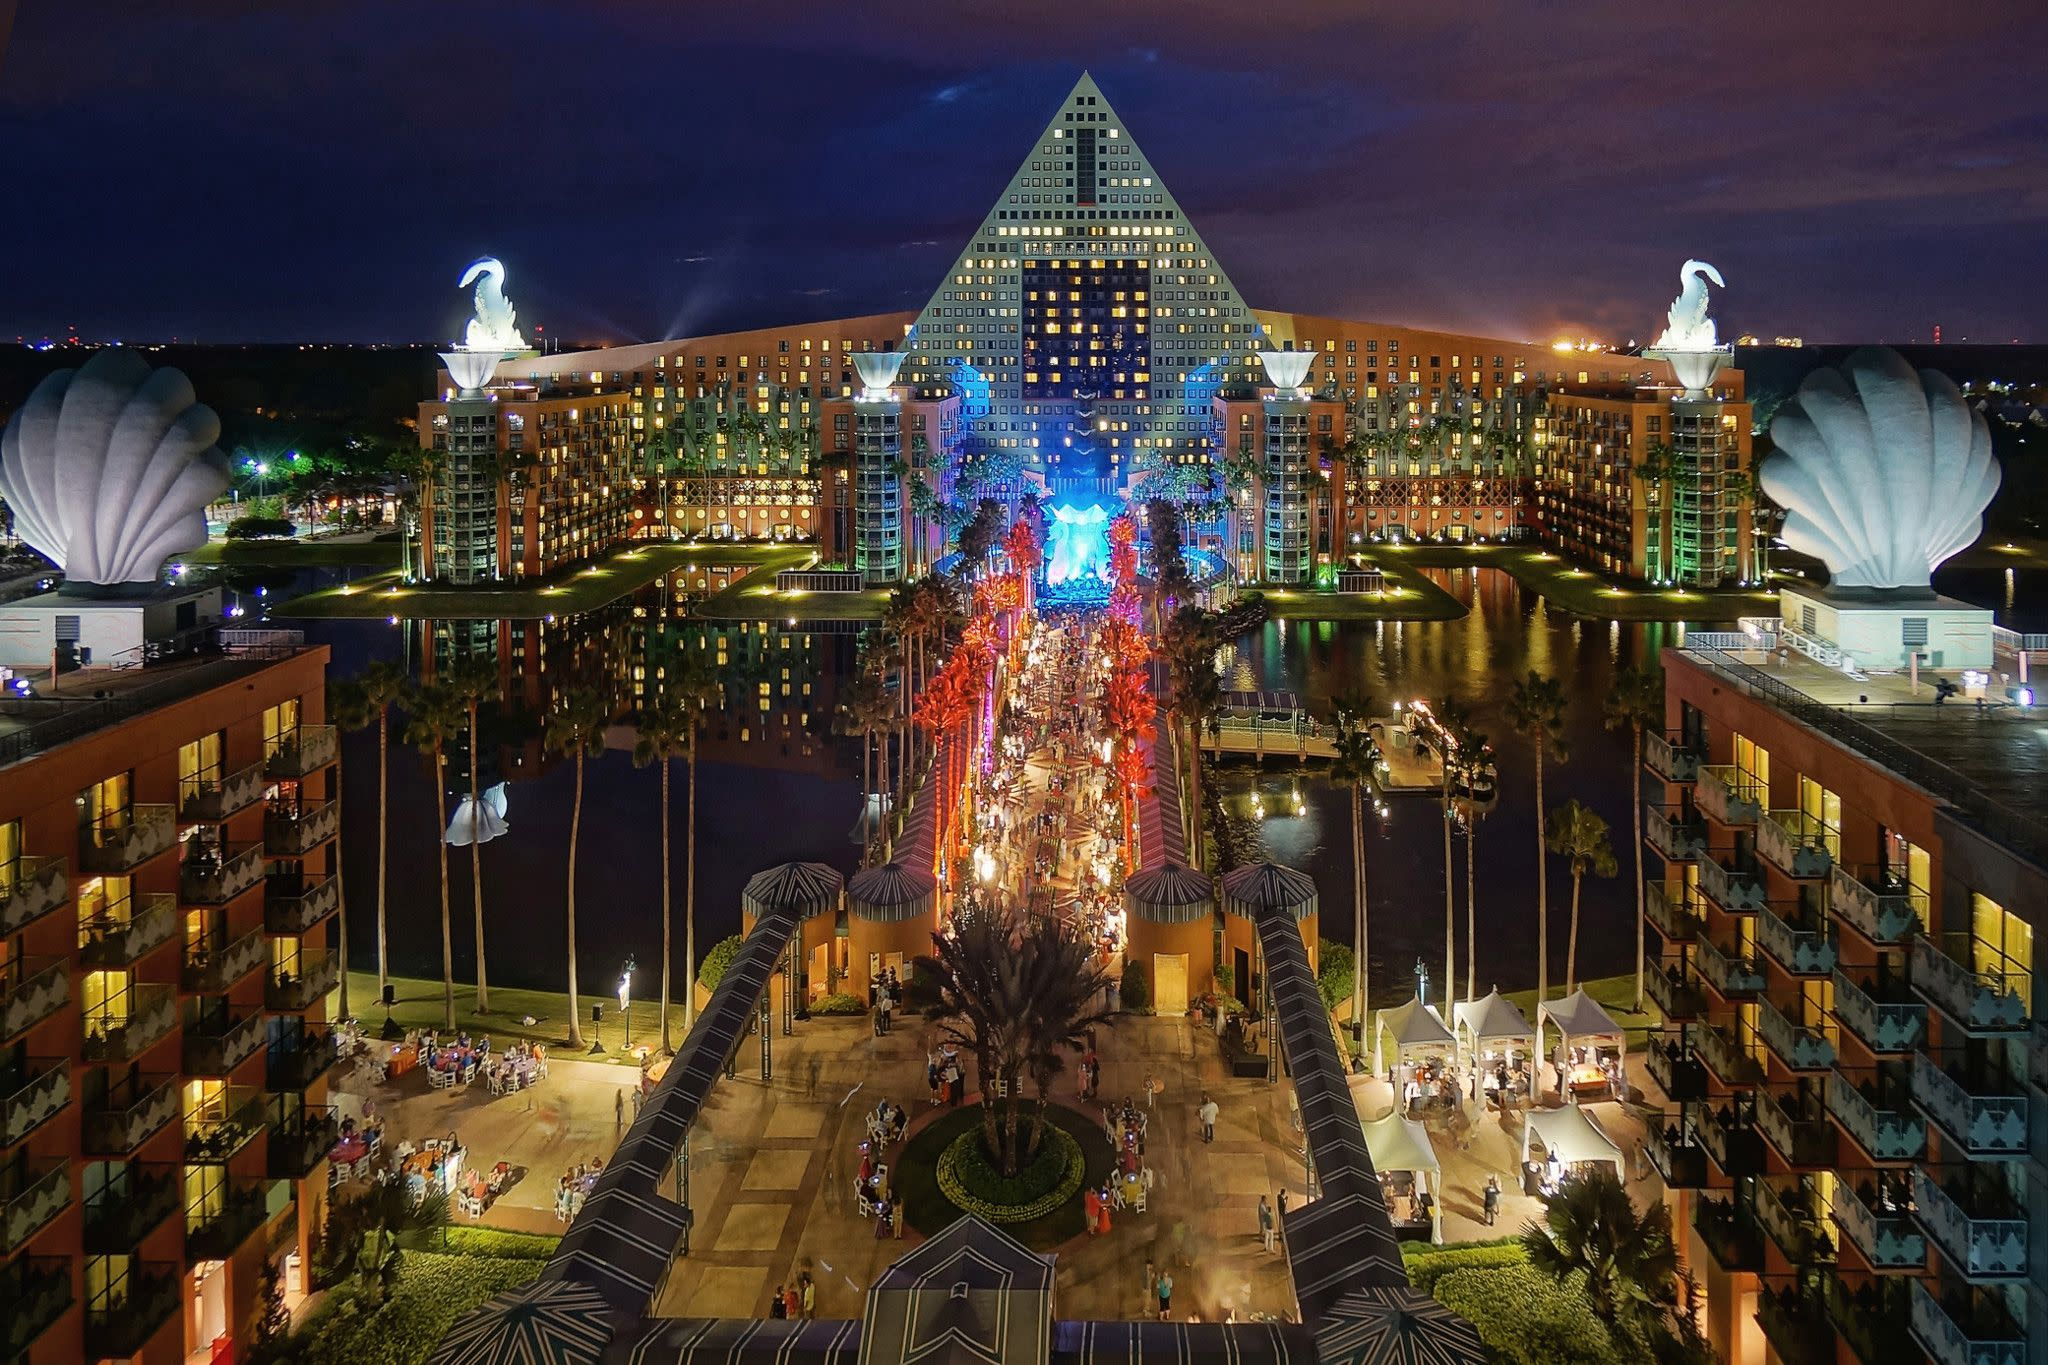 Walt Disney World Swan and Dolphin Resort in Orlando